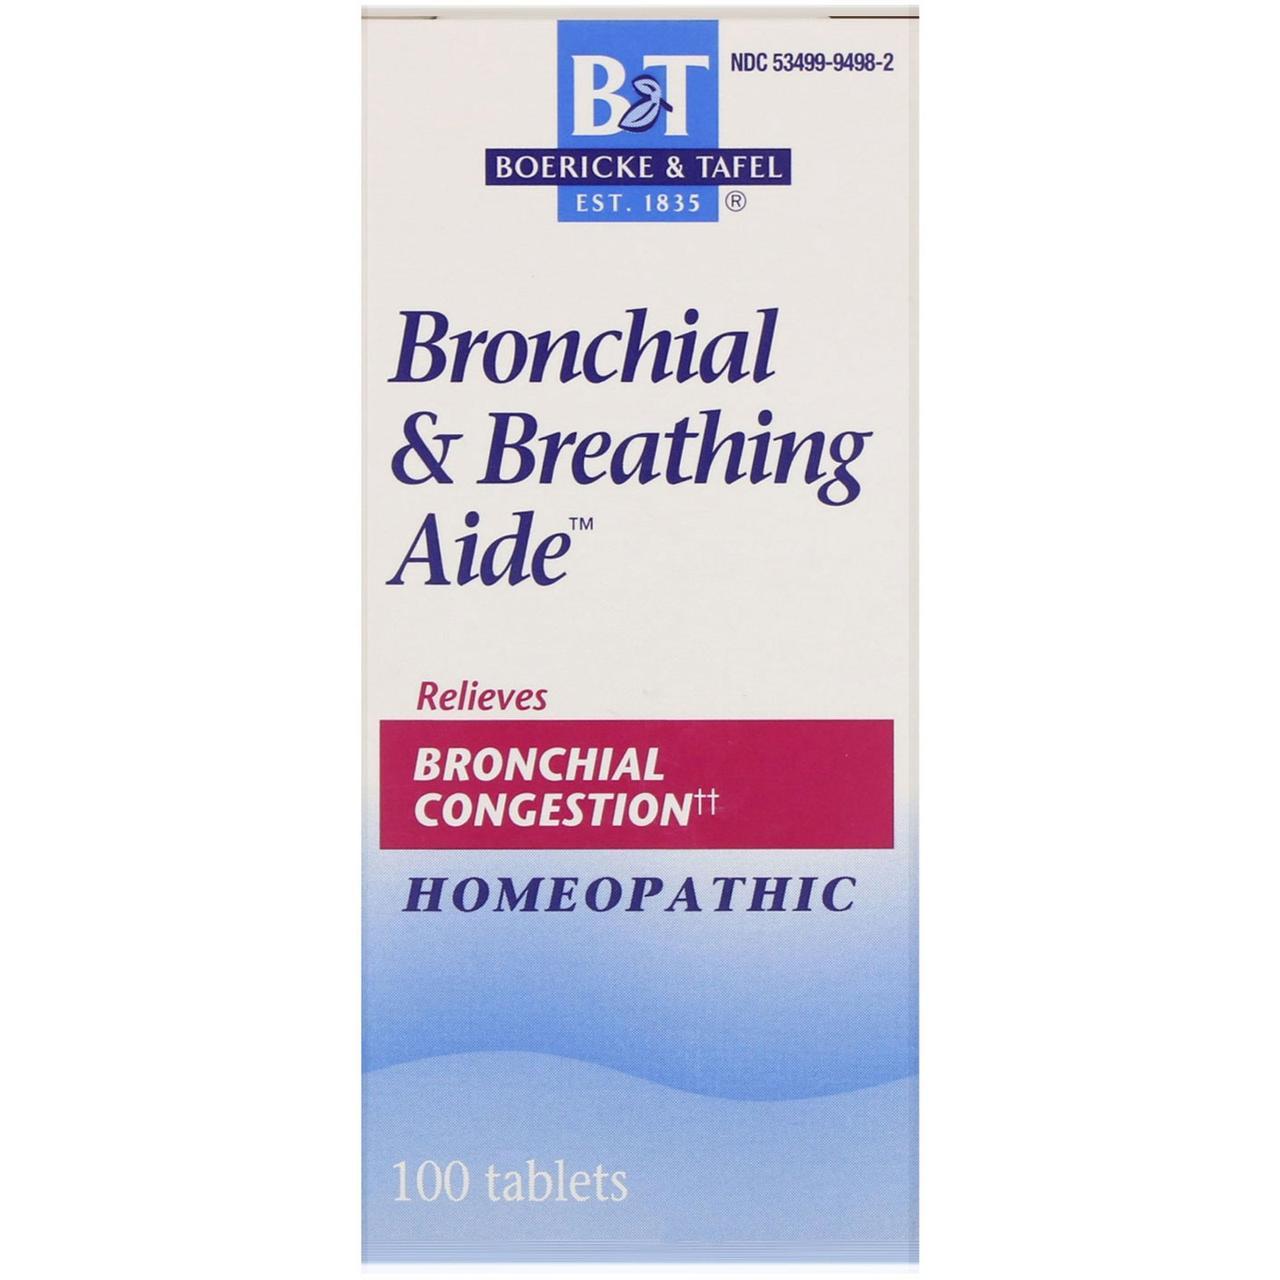 Boericke & Tafel, Помощь при бронхите и астме, 100 таблеток